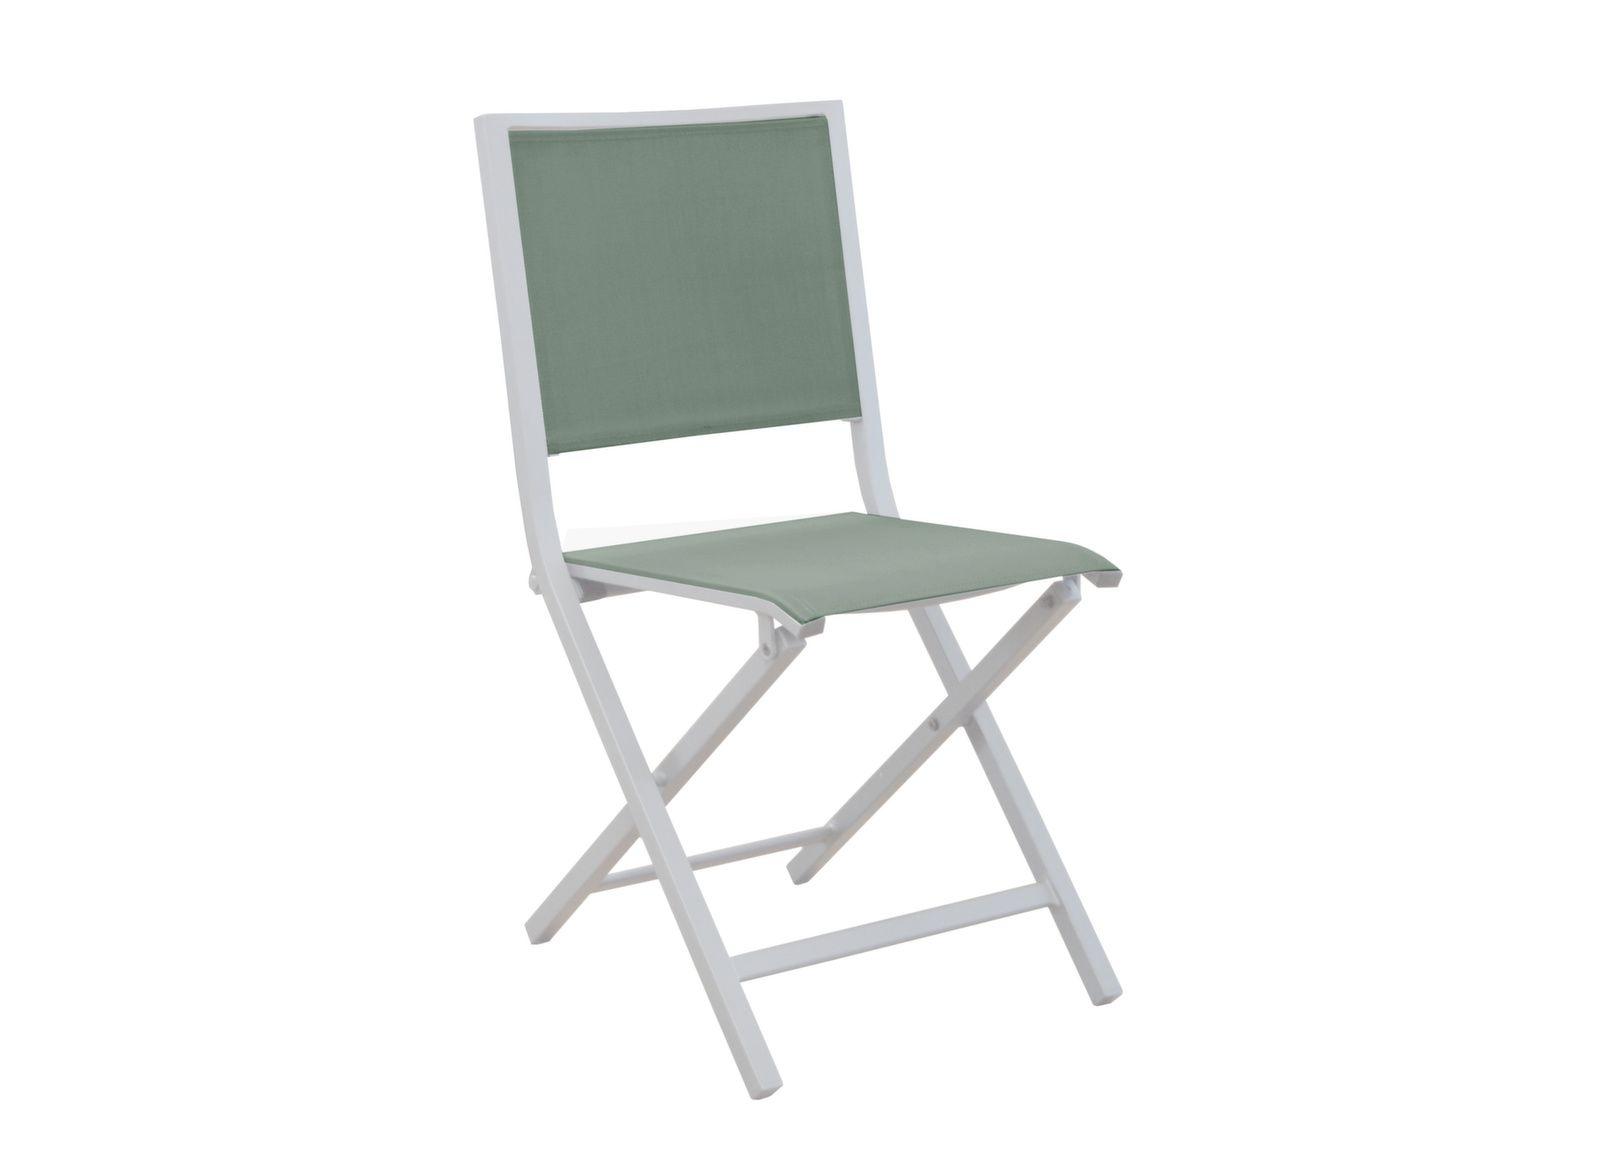 Chaise pliante Ida